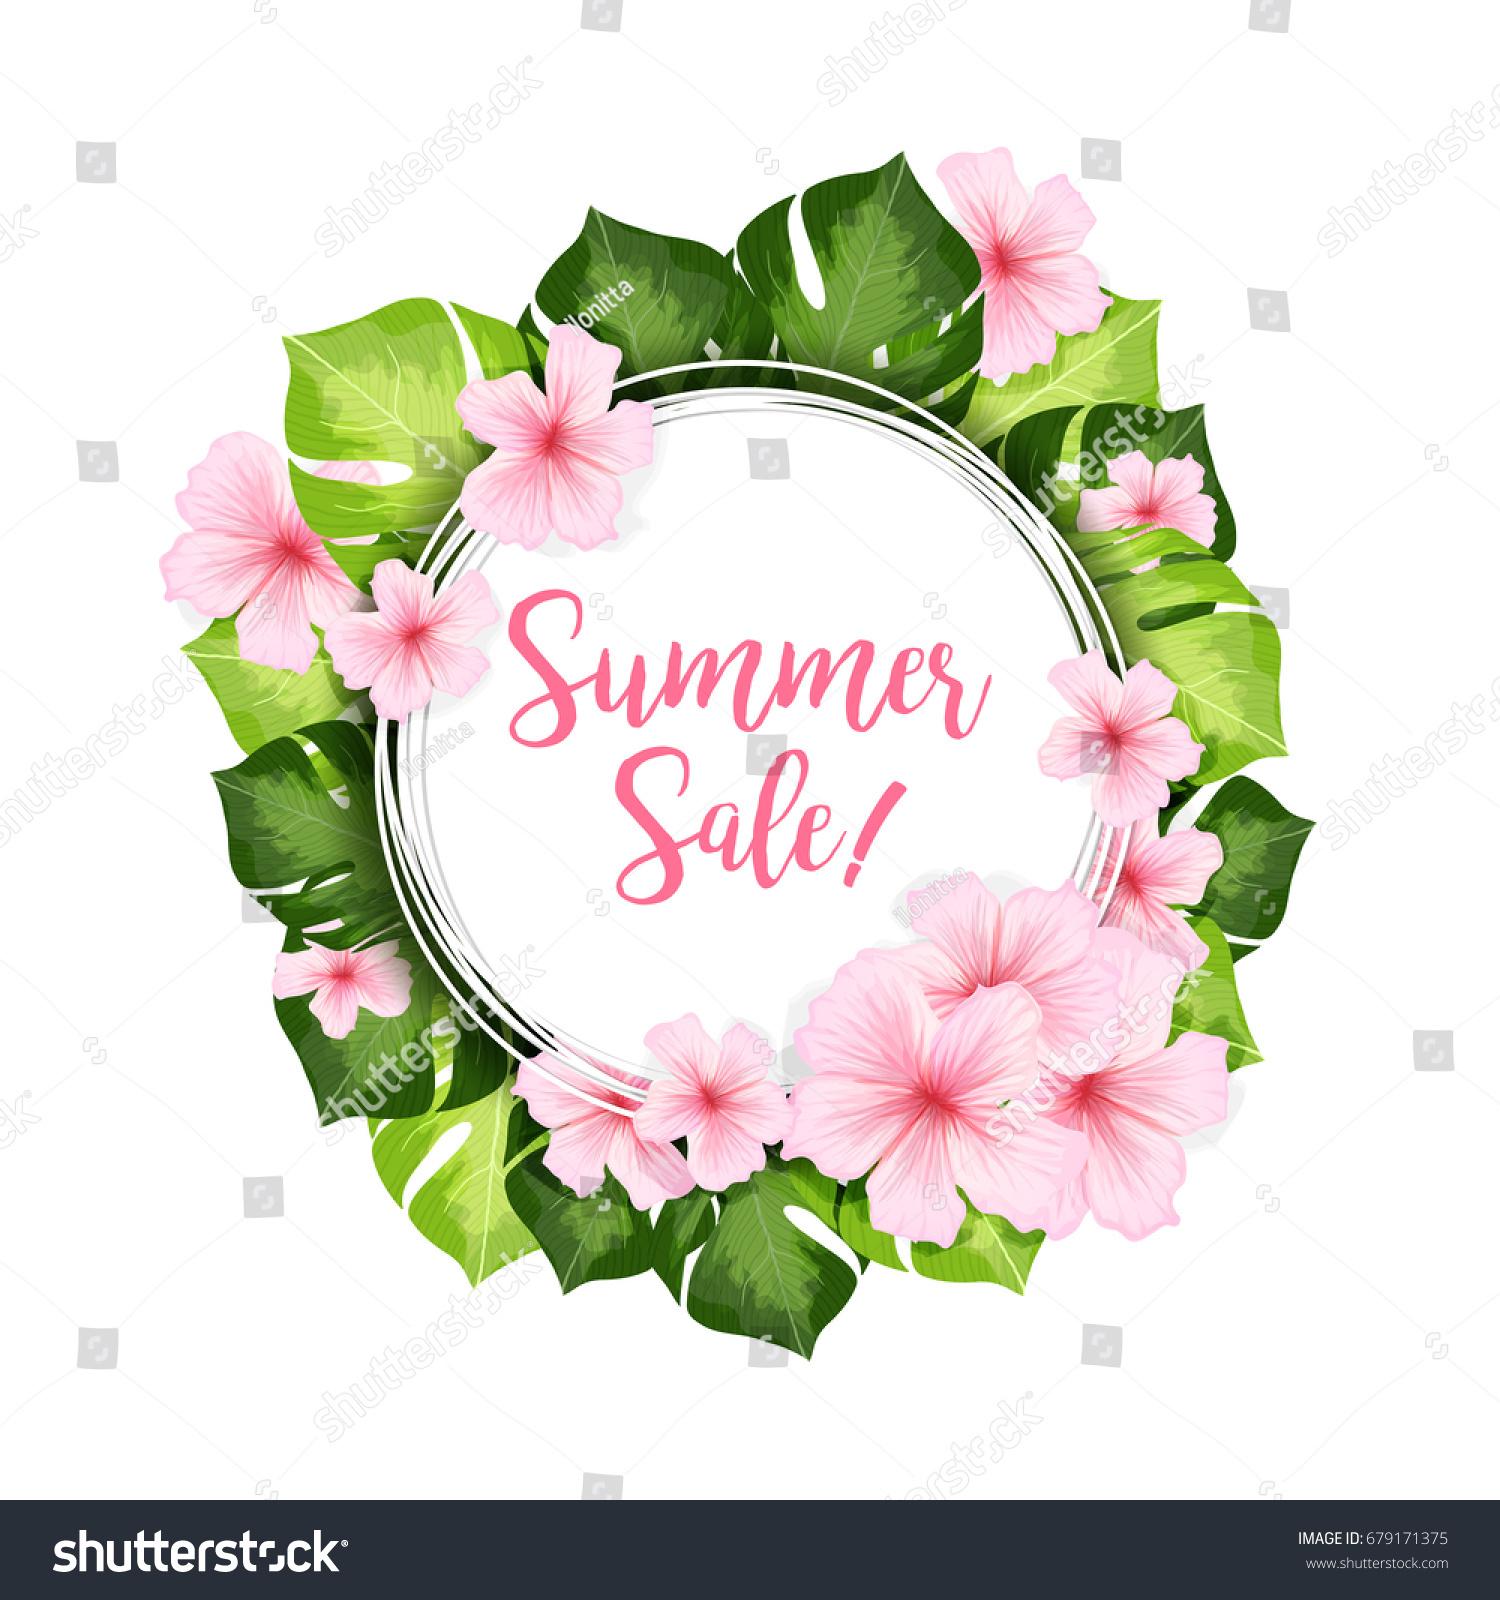 Summer sale circle banner frame green stock vector 679171375 summer sale circle banner or frame of green leaves and pink hawaiian flowers realistic vector izmirmasajfo